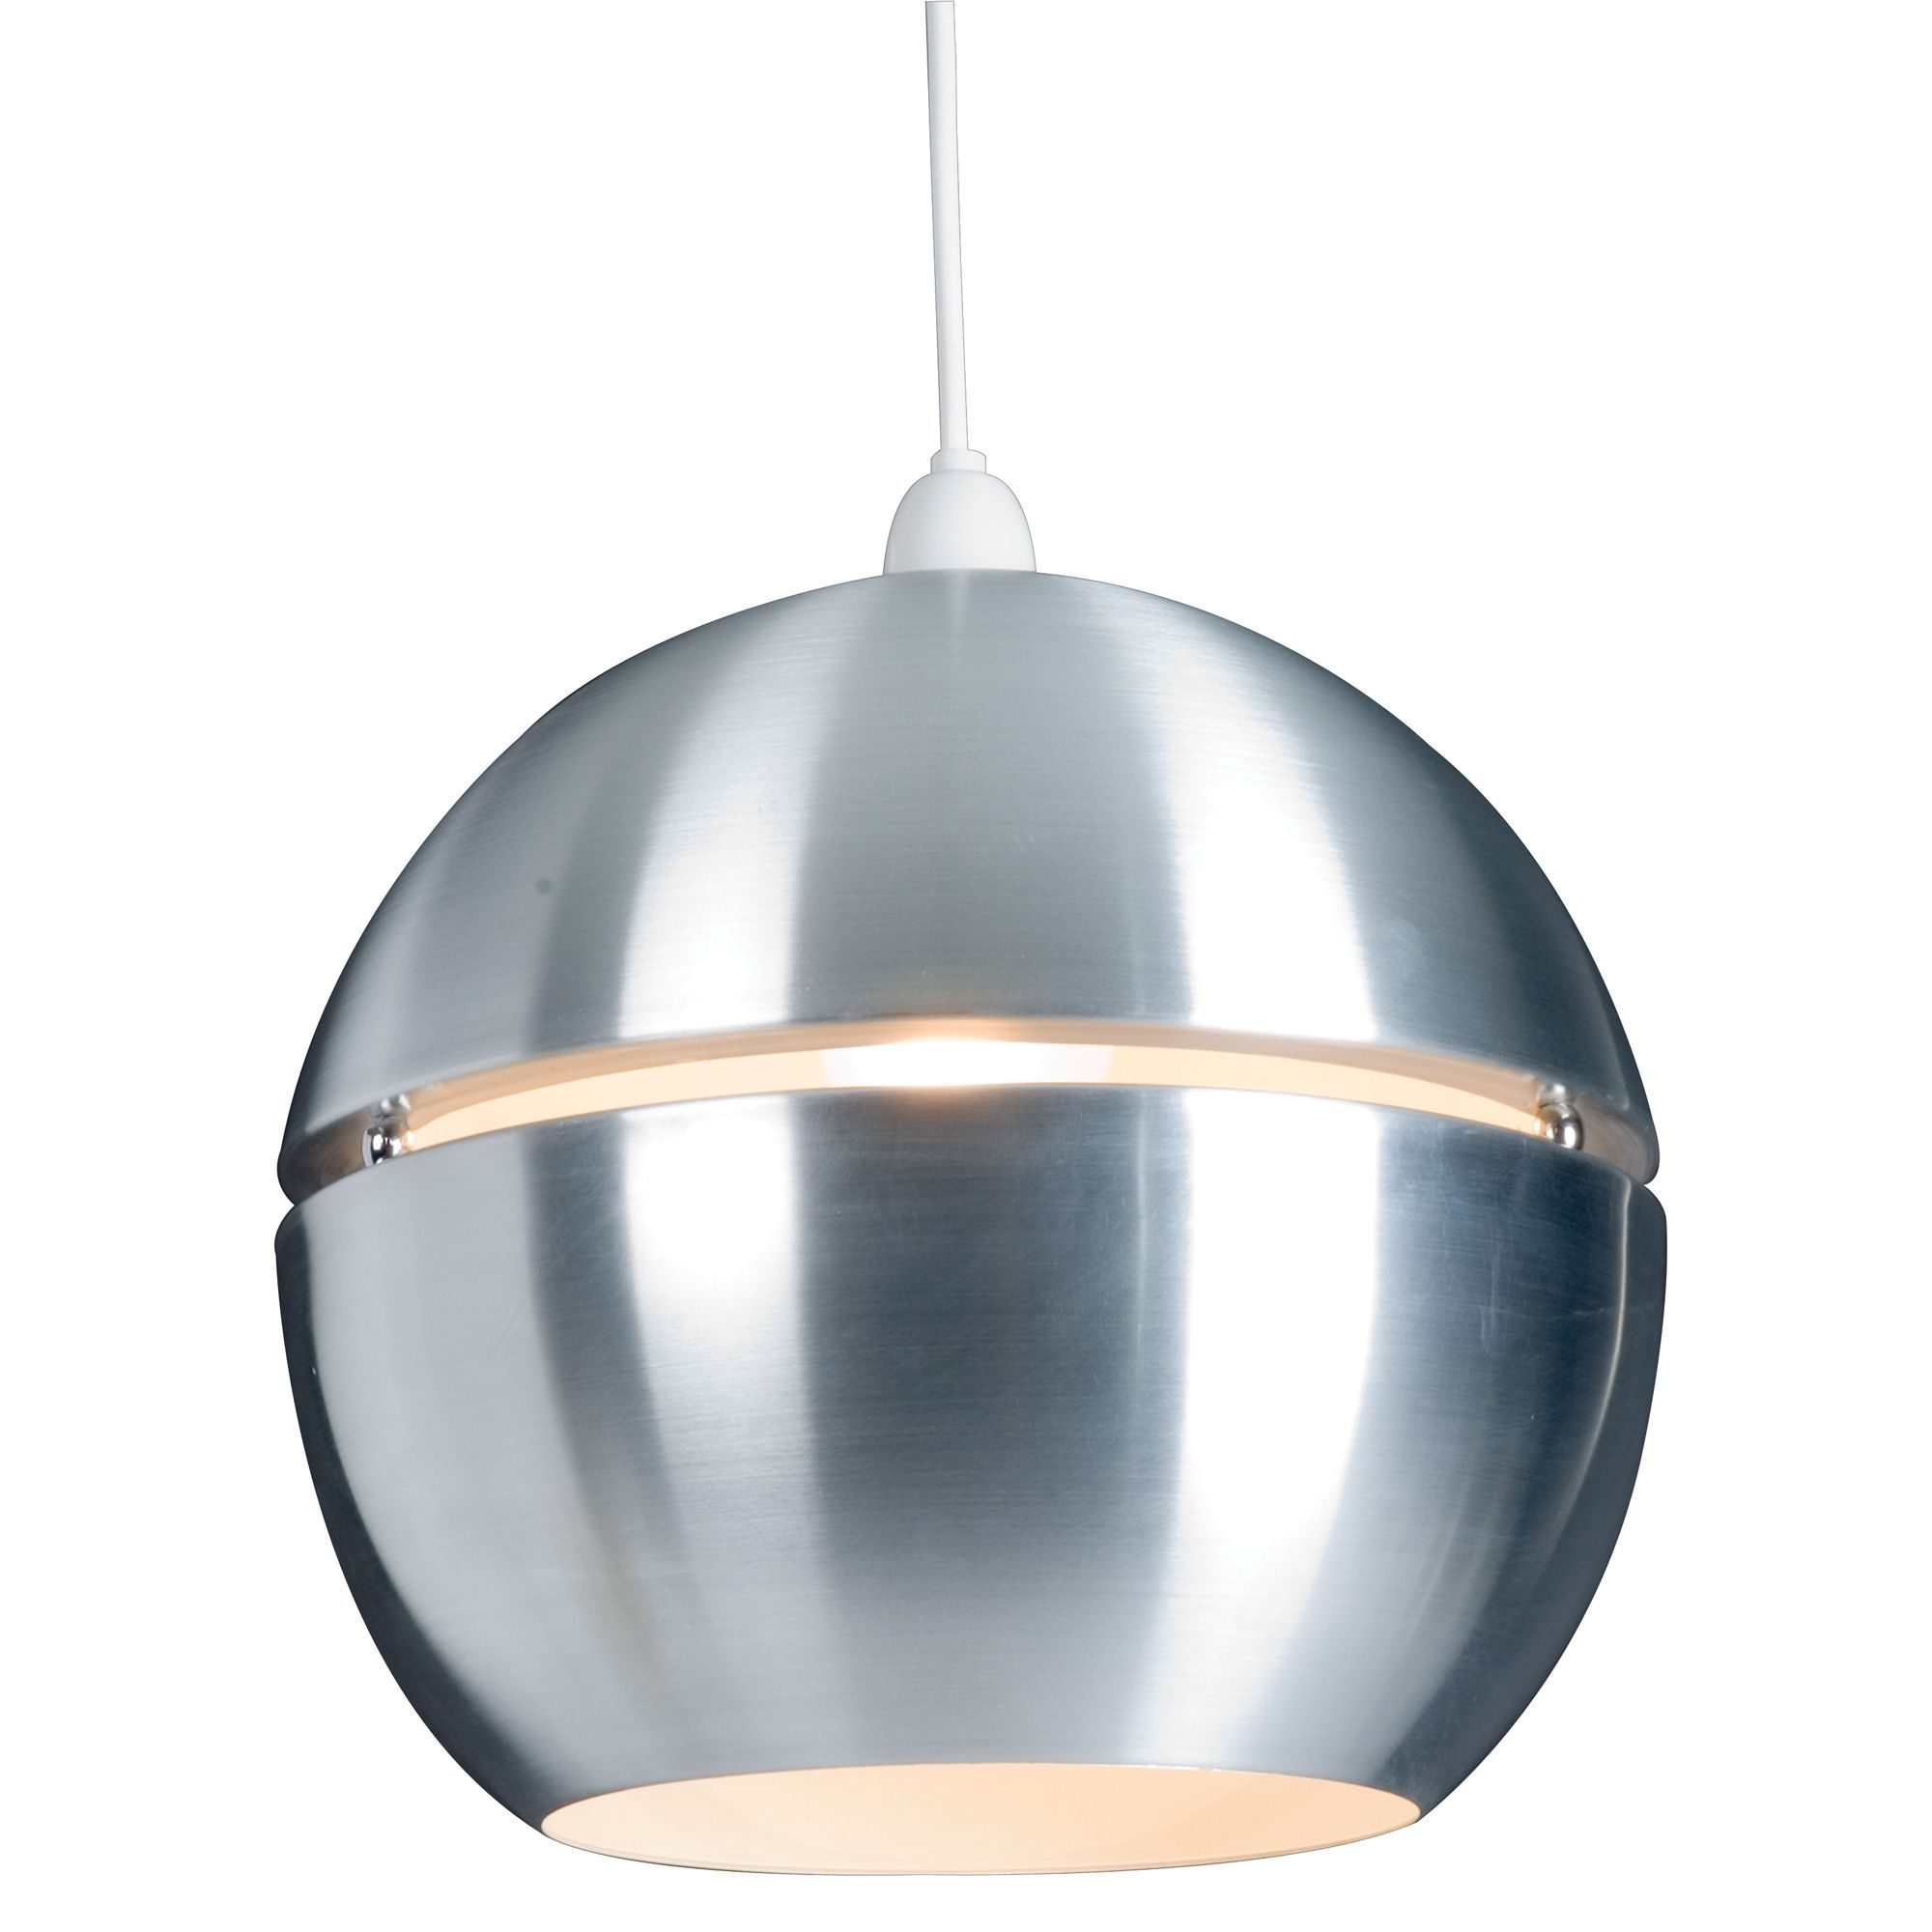 Rainbow Aluminium Spherical Pendant Light Shade